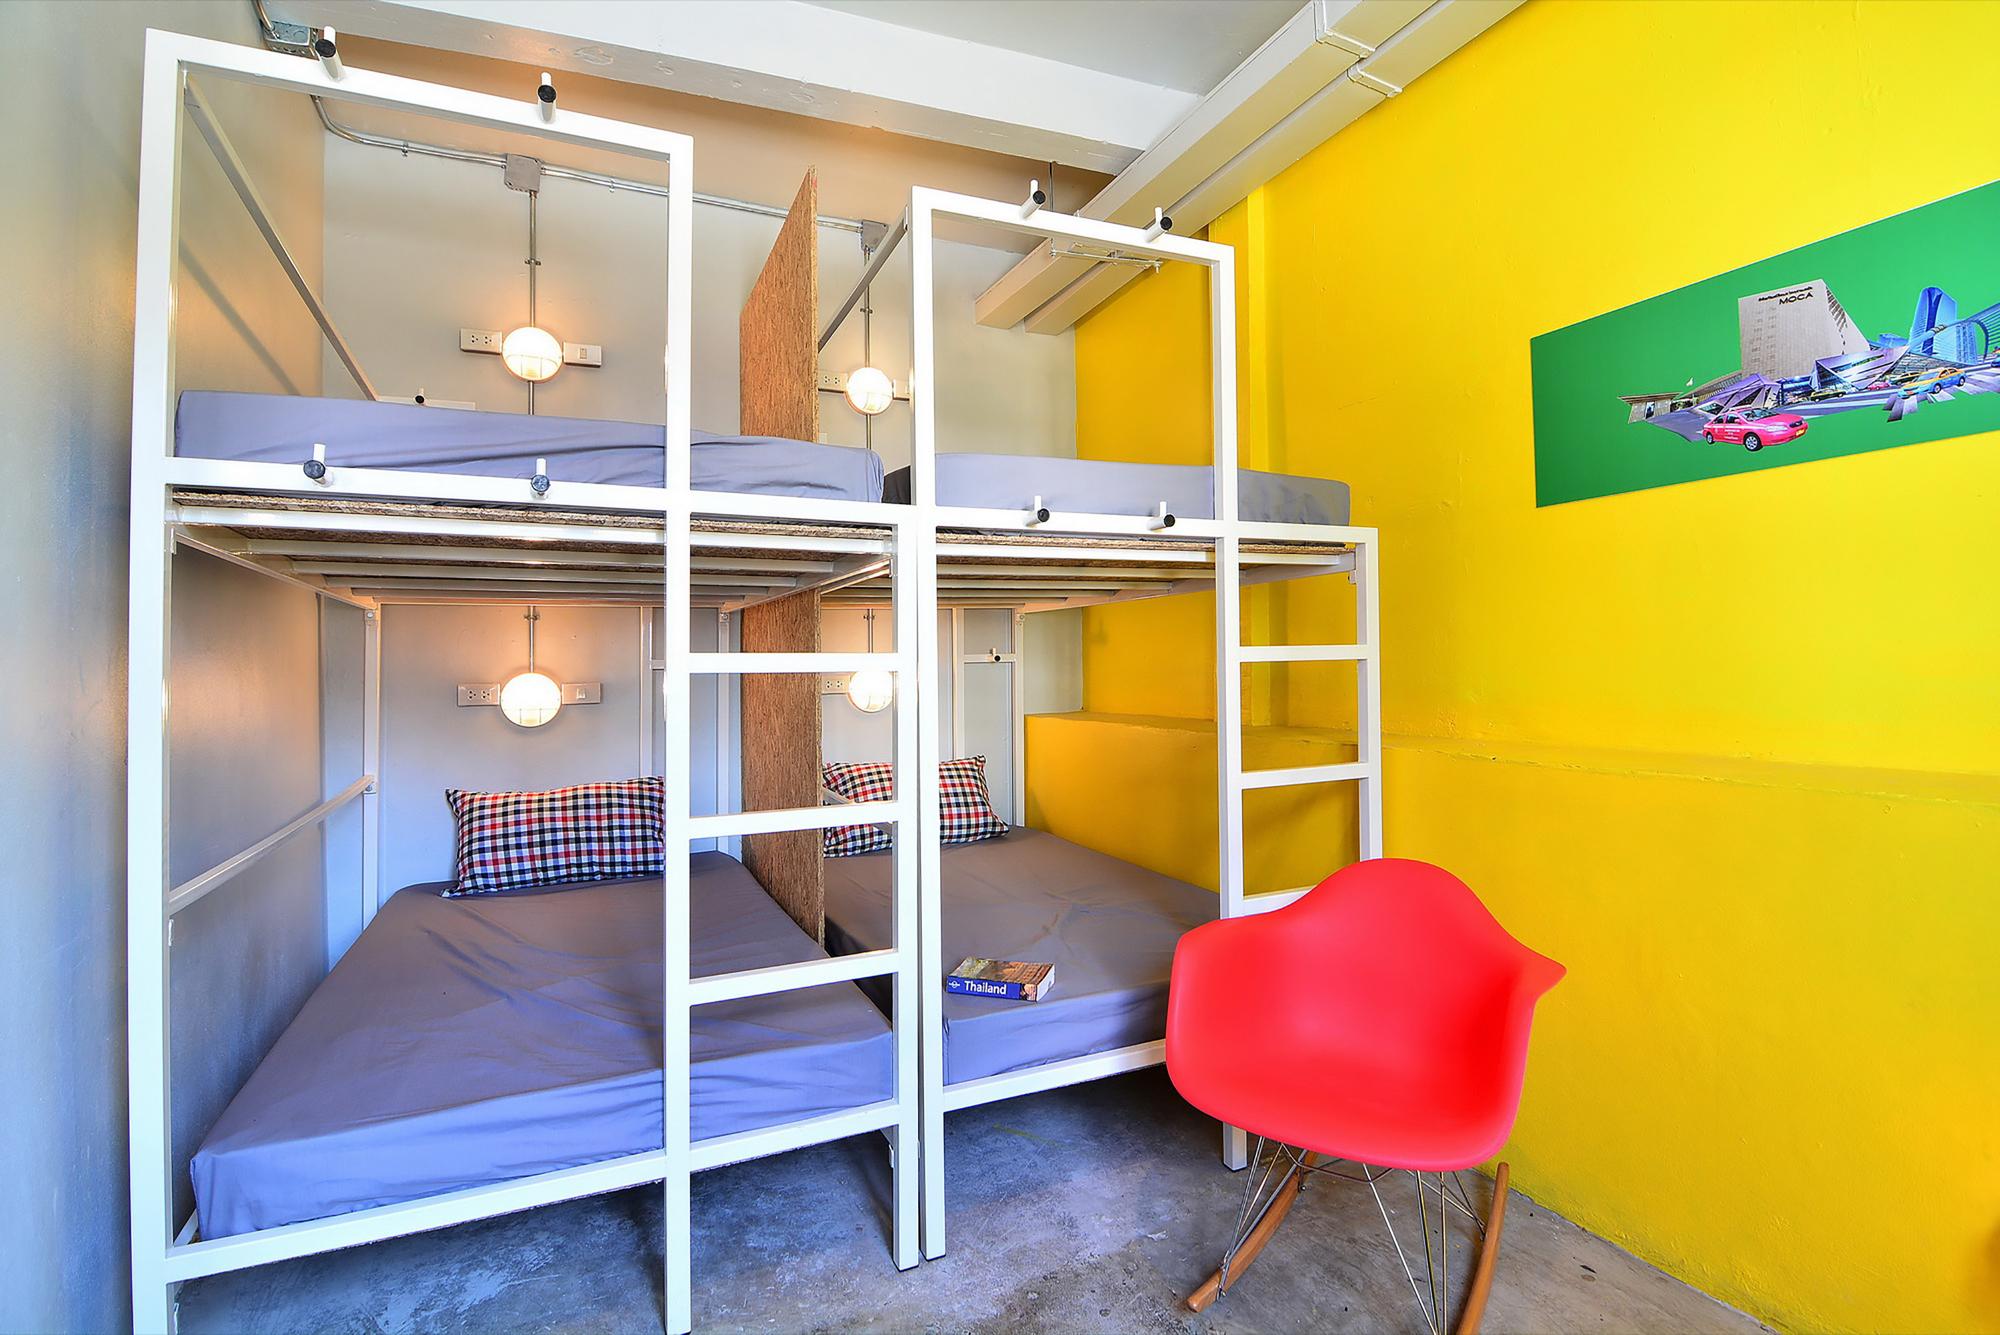 Gallery of adventure hostel integrated design office 9 for Hostel design